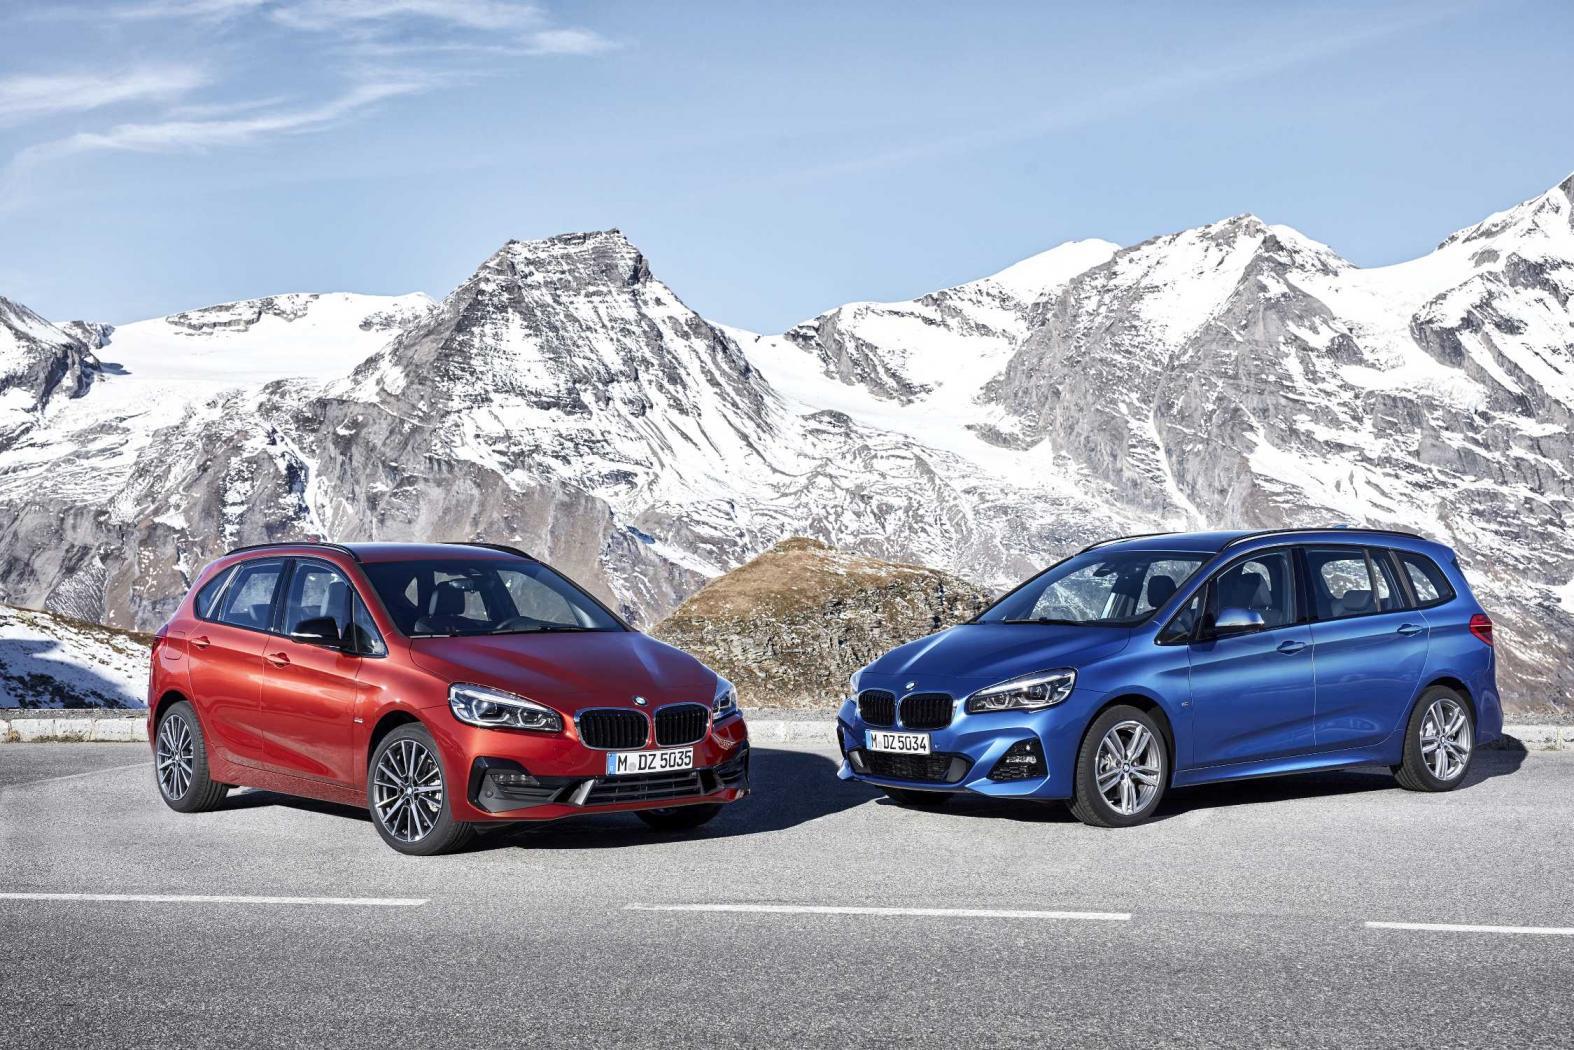 Fiche-occasion-BMW-Serie-2-Active-Tourer-F45-et-Gran-Tourer-F46-2.jpeg